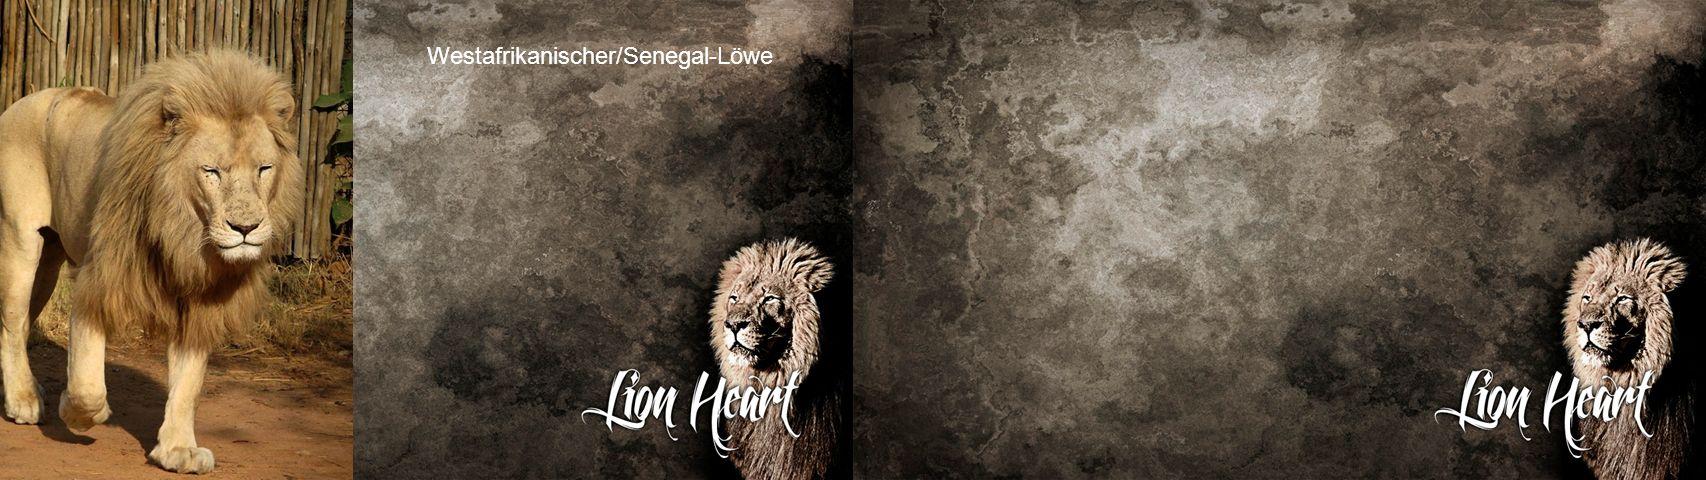 Westafrikanischer/Senegal-Löwe